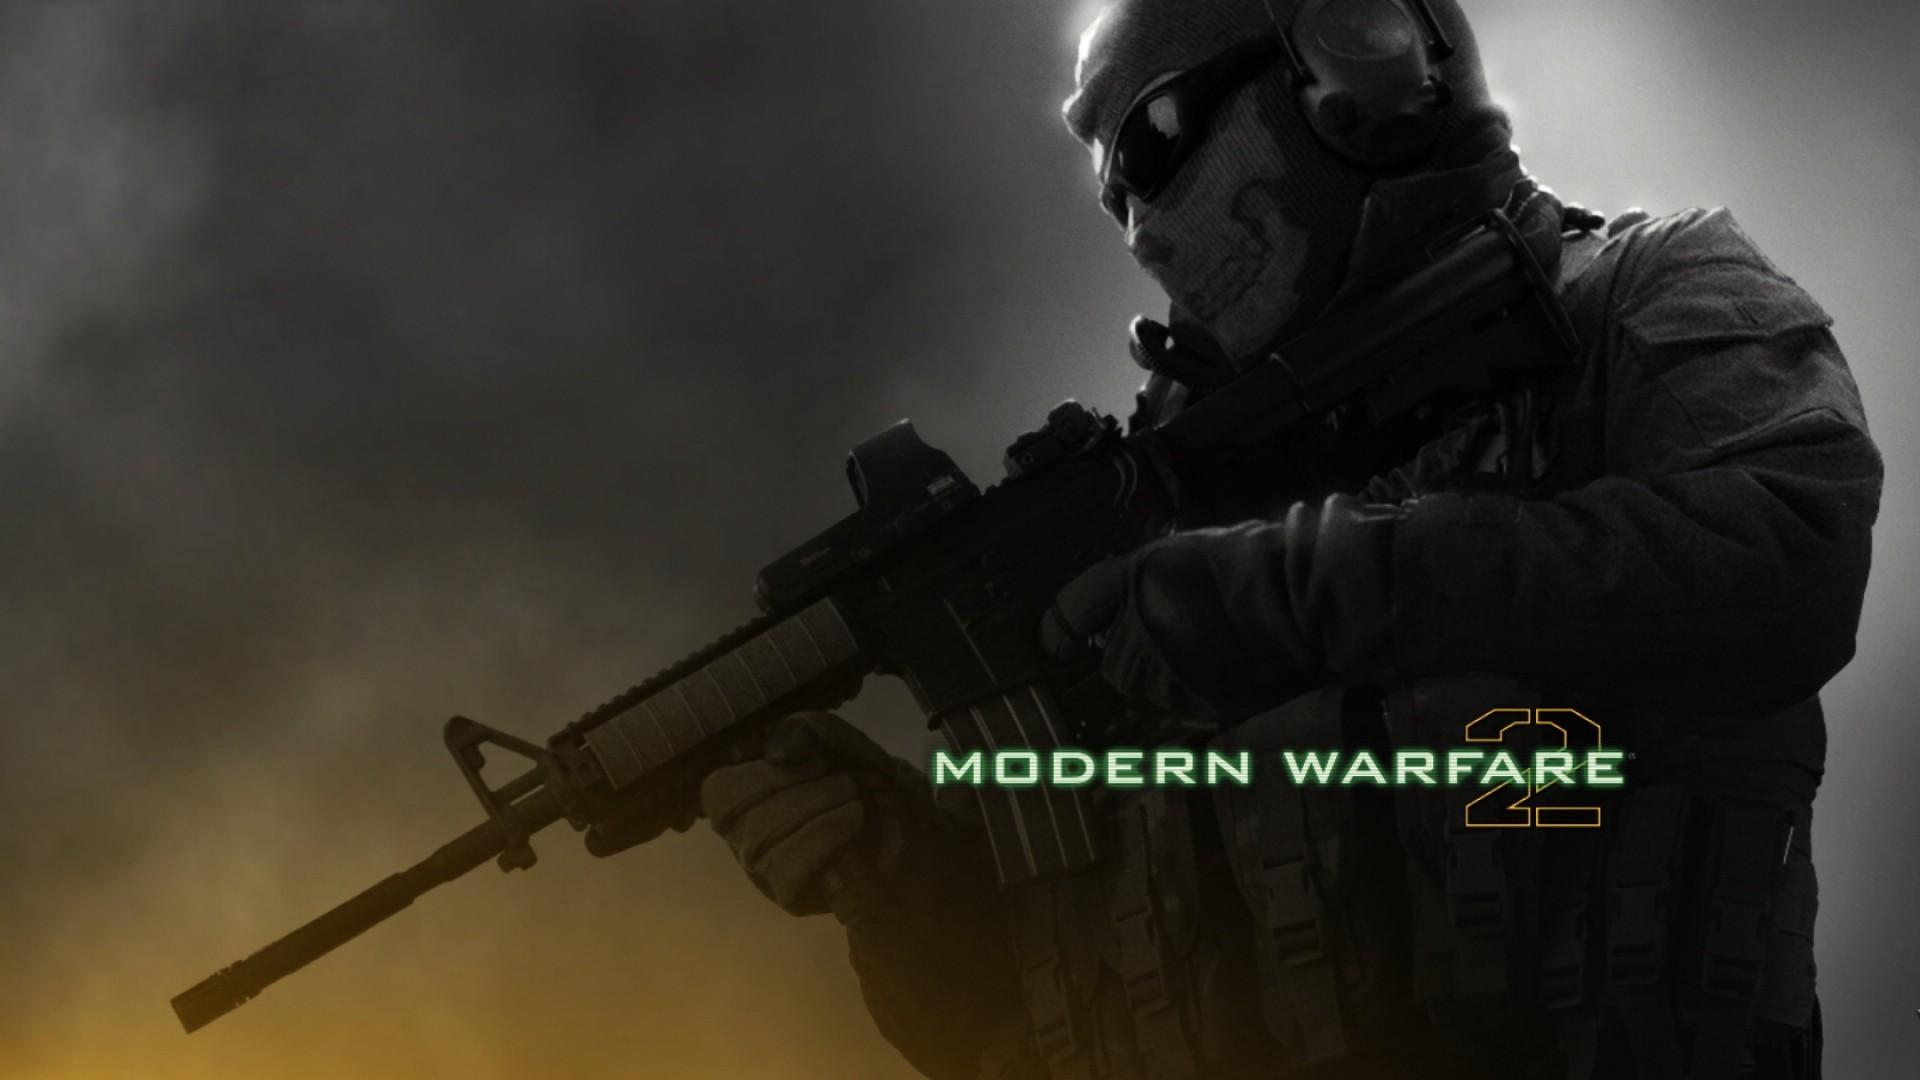 modern warfare 2 wallpaper hd ·①